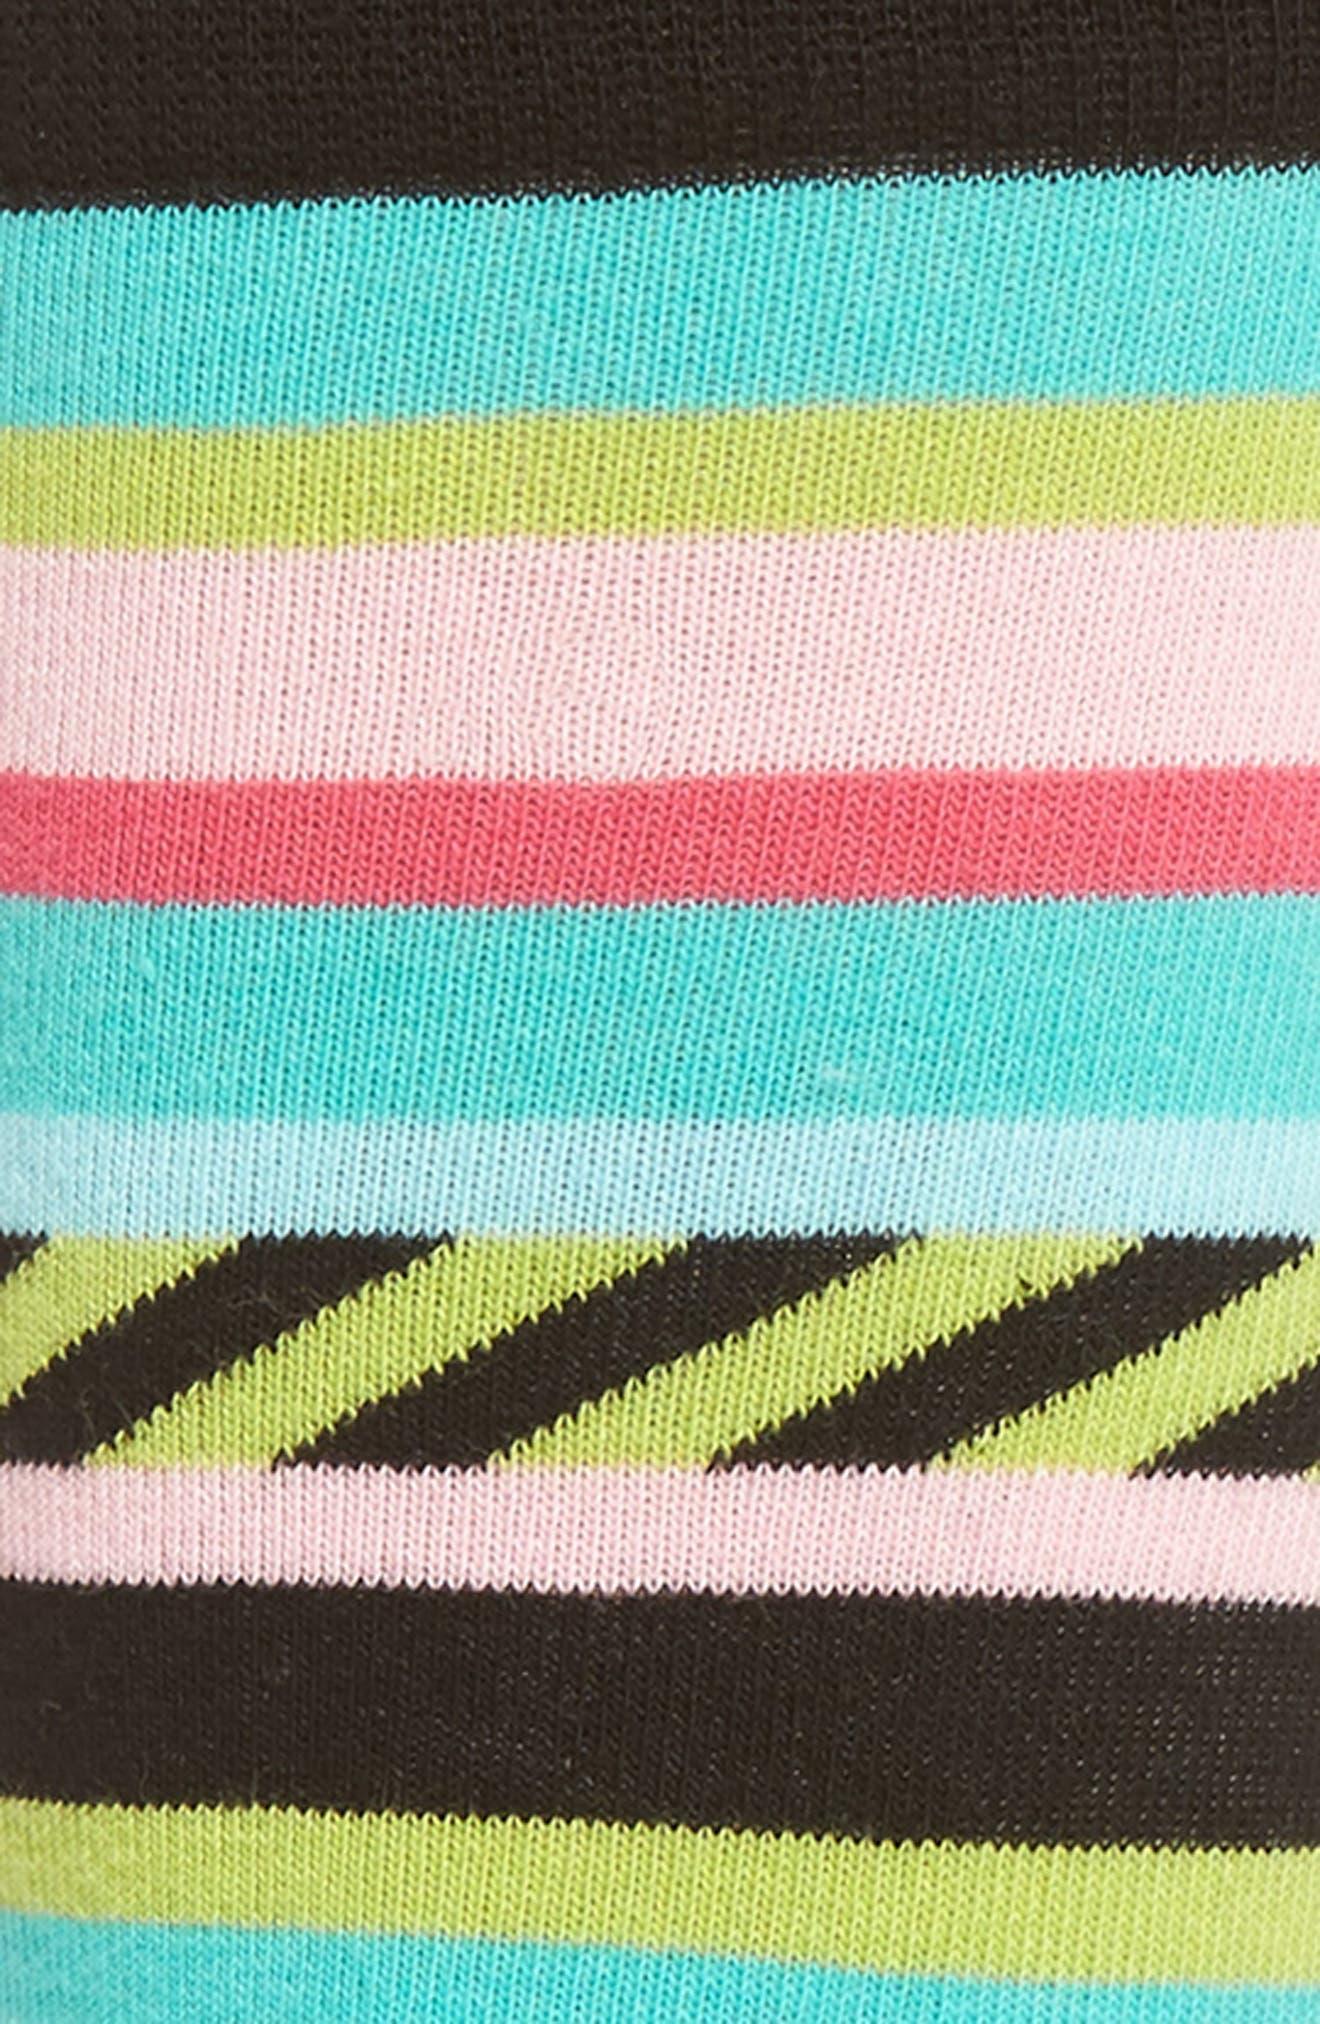 Stripes & Stripes Crew Socks,                             Alternate thumbnail 2, color,                             018